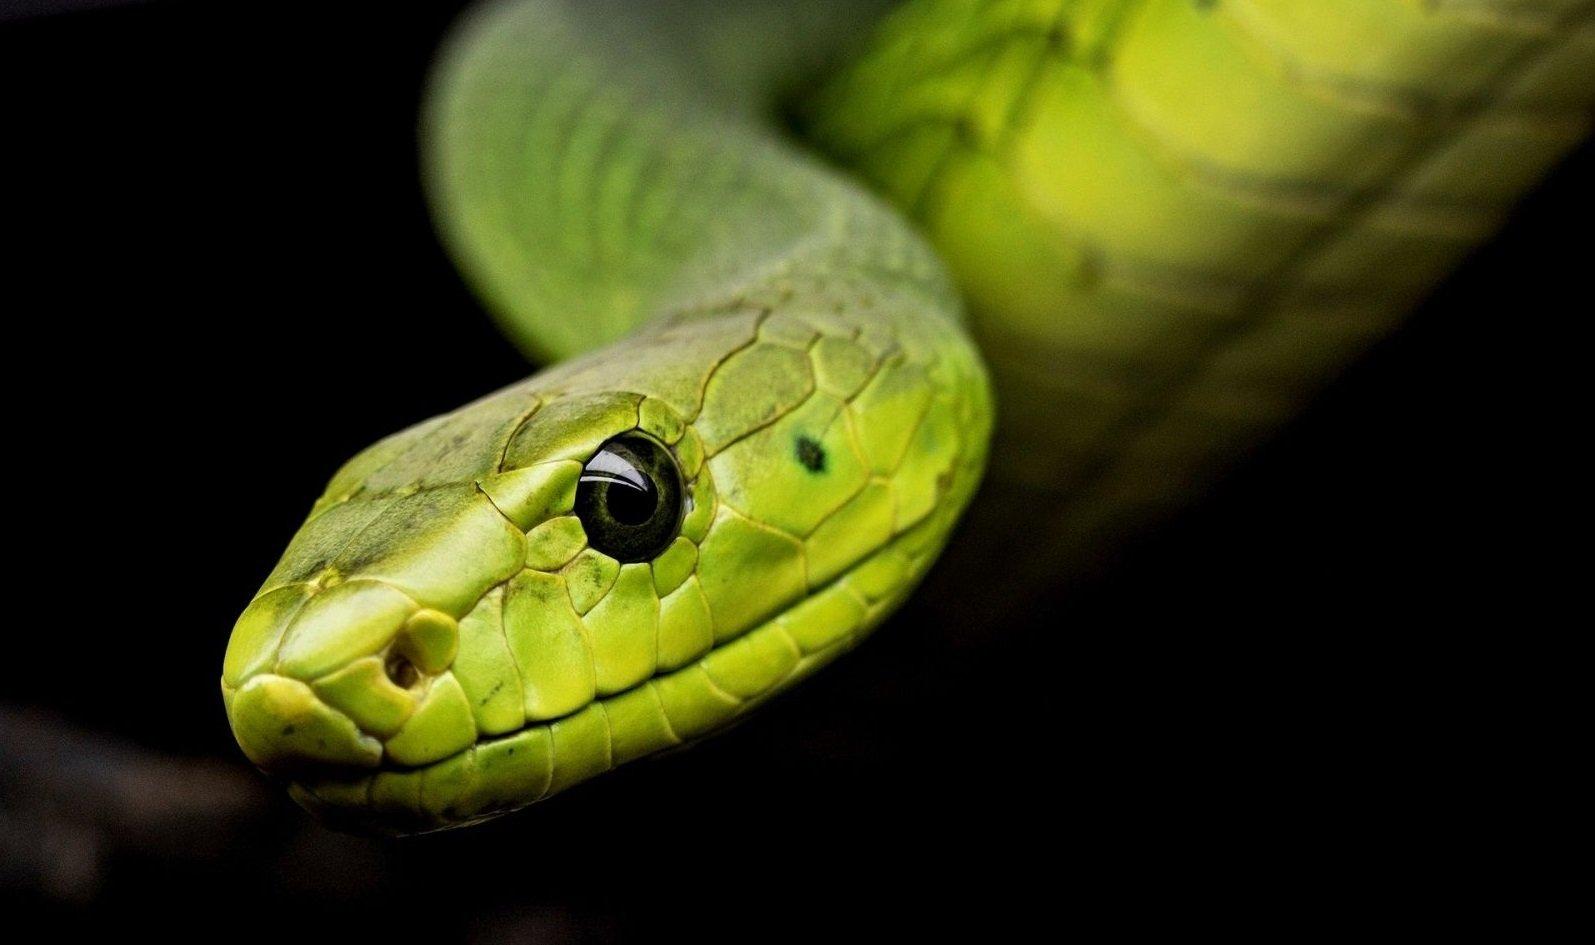 Свято 25 вересня: в день Автонома уважно стежили за зміями